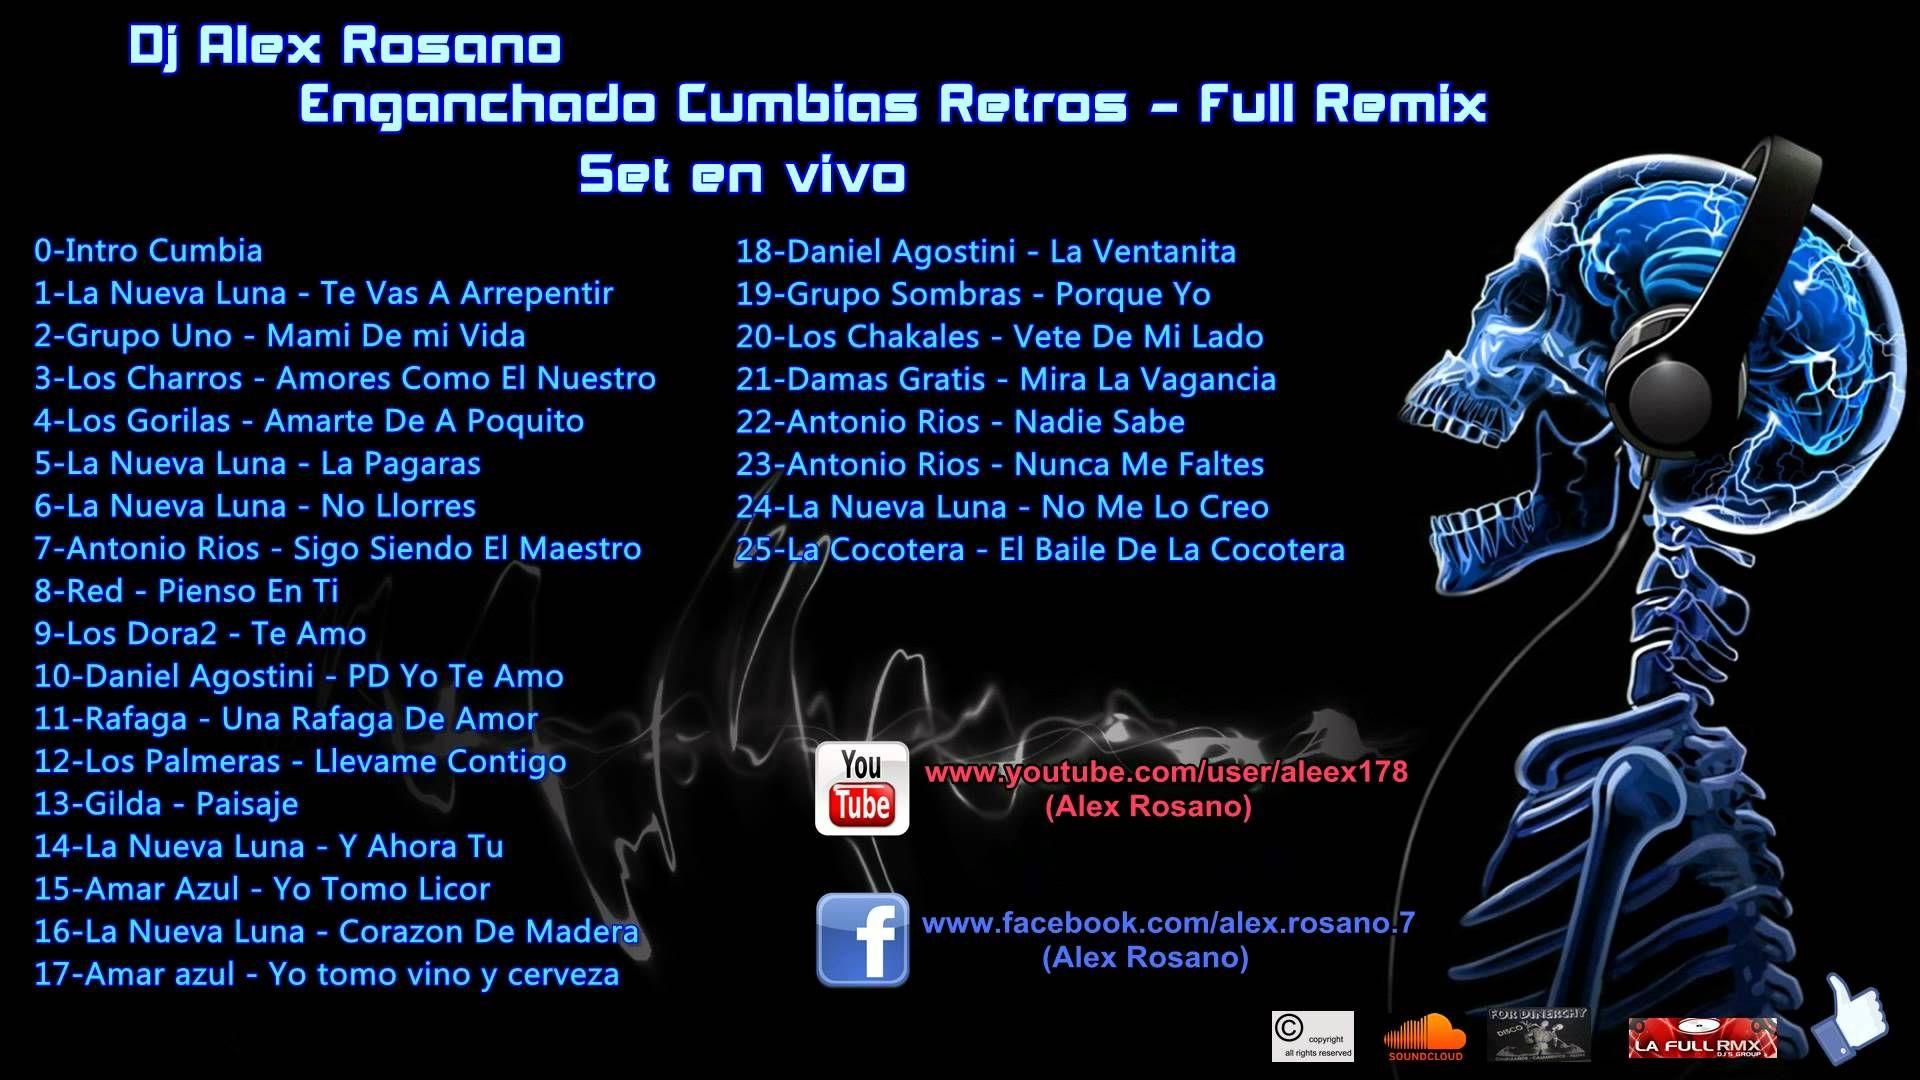 Enganchado Cumbias Retros|Cumbias Viejas - Full Remix - Dj Alex Rosano -...